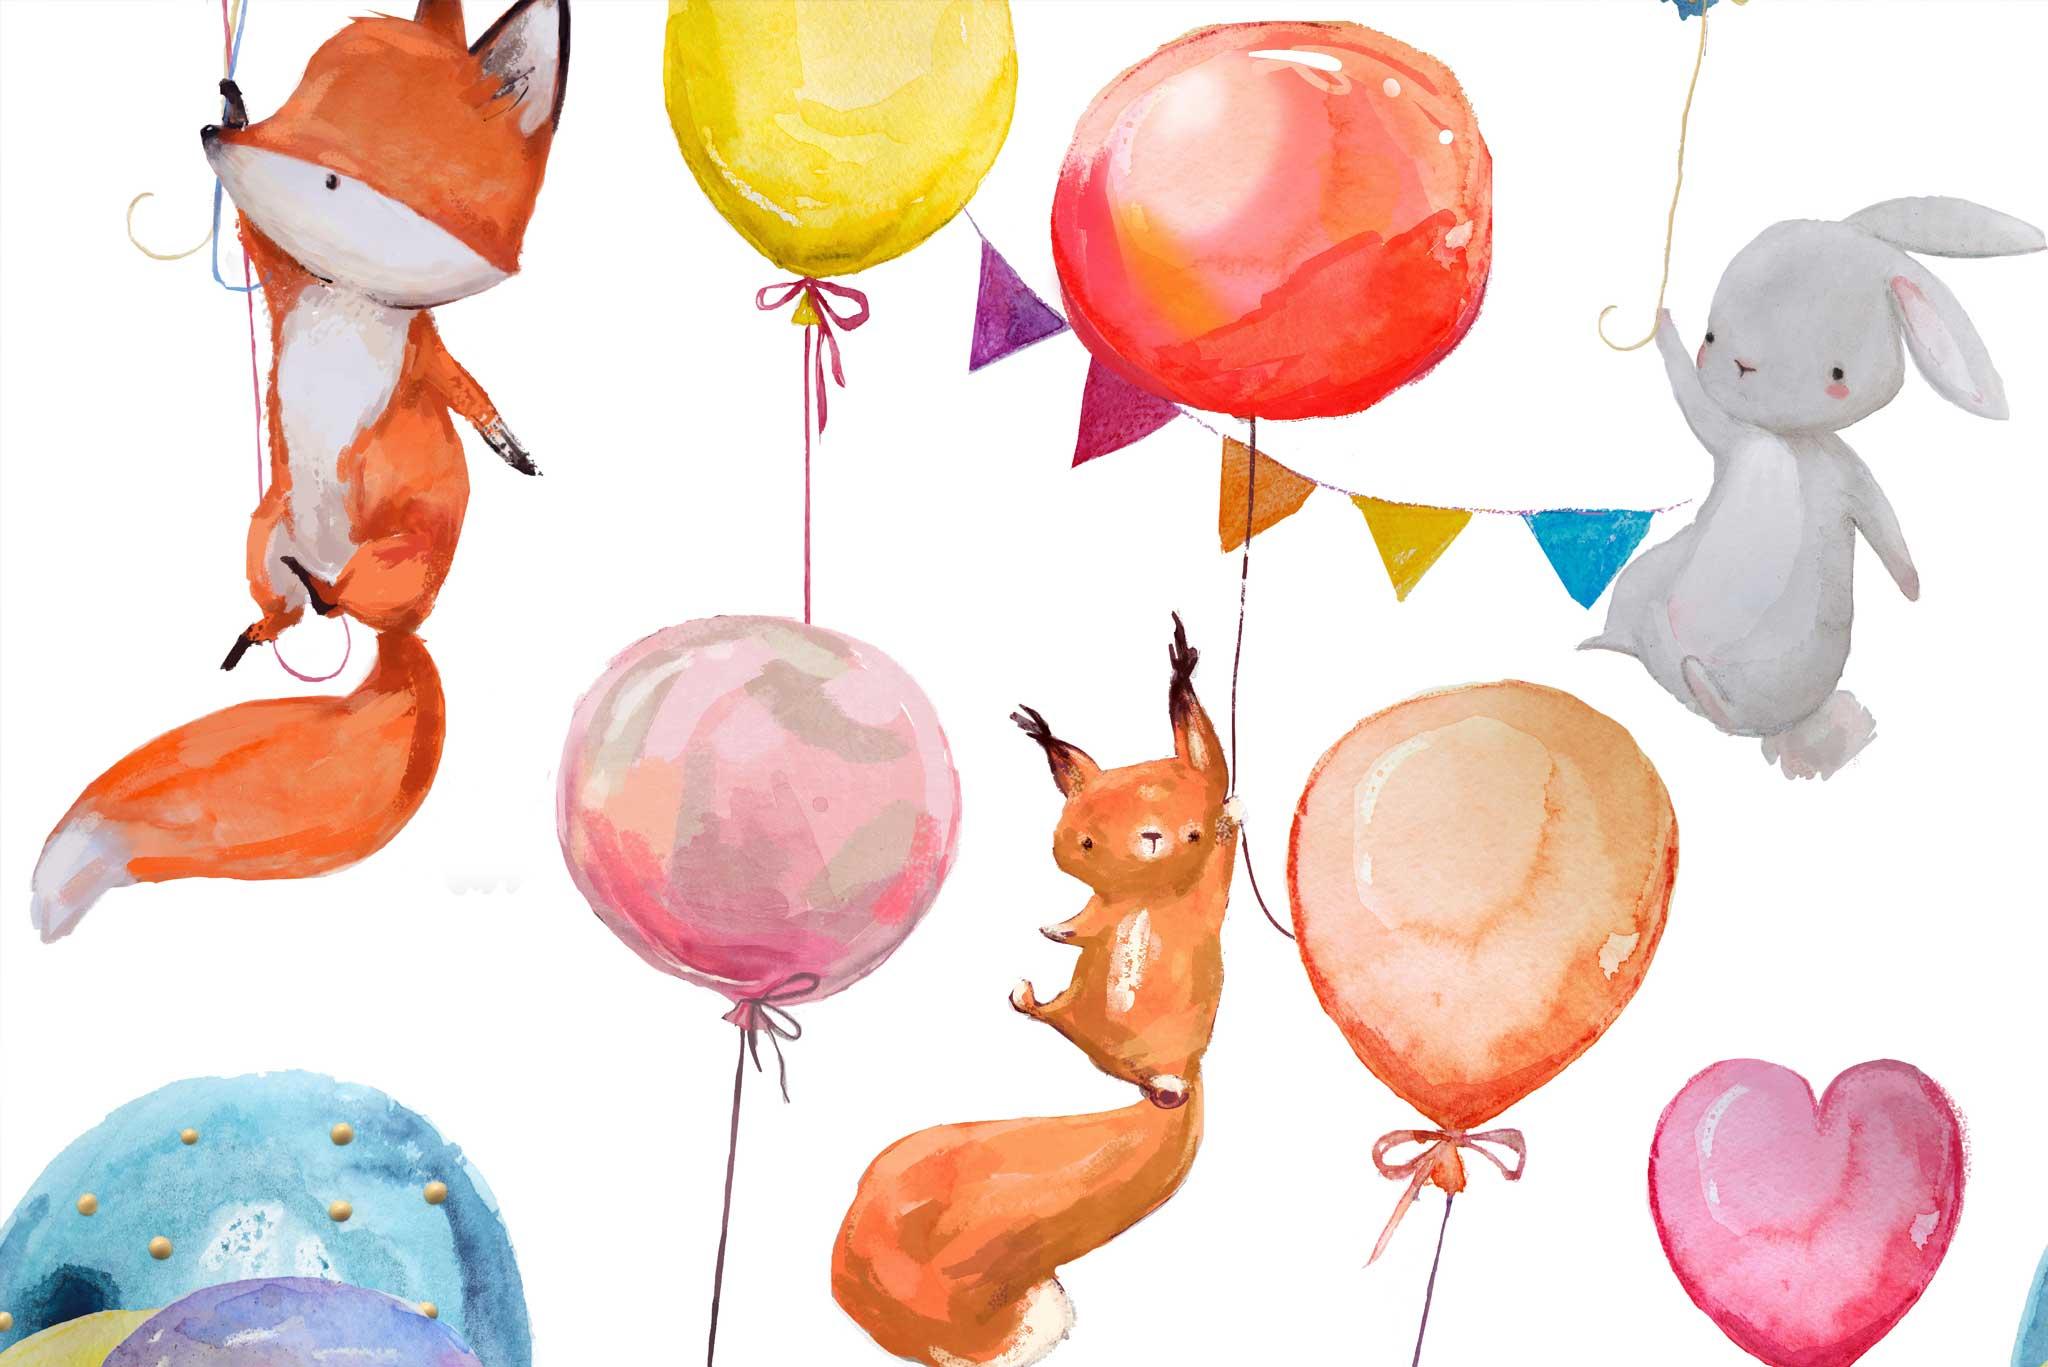 tapet-fototapet-design-decor-mural-customizabil-comanda-personalizat-bucuresti-daring-prints-motiv-model-copii-desen-animale-vulpite-baloane